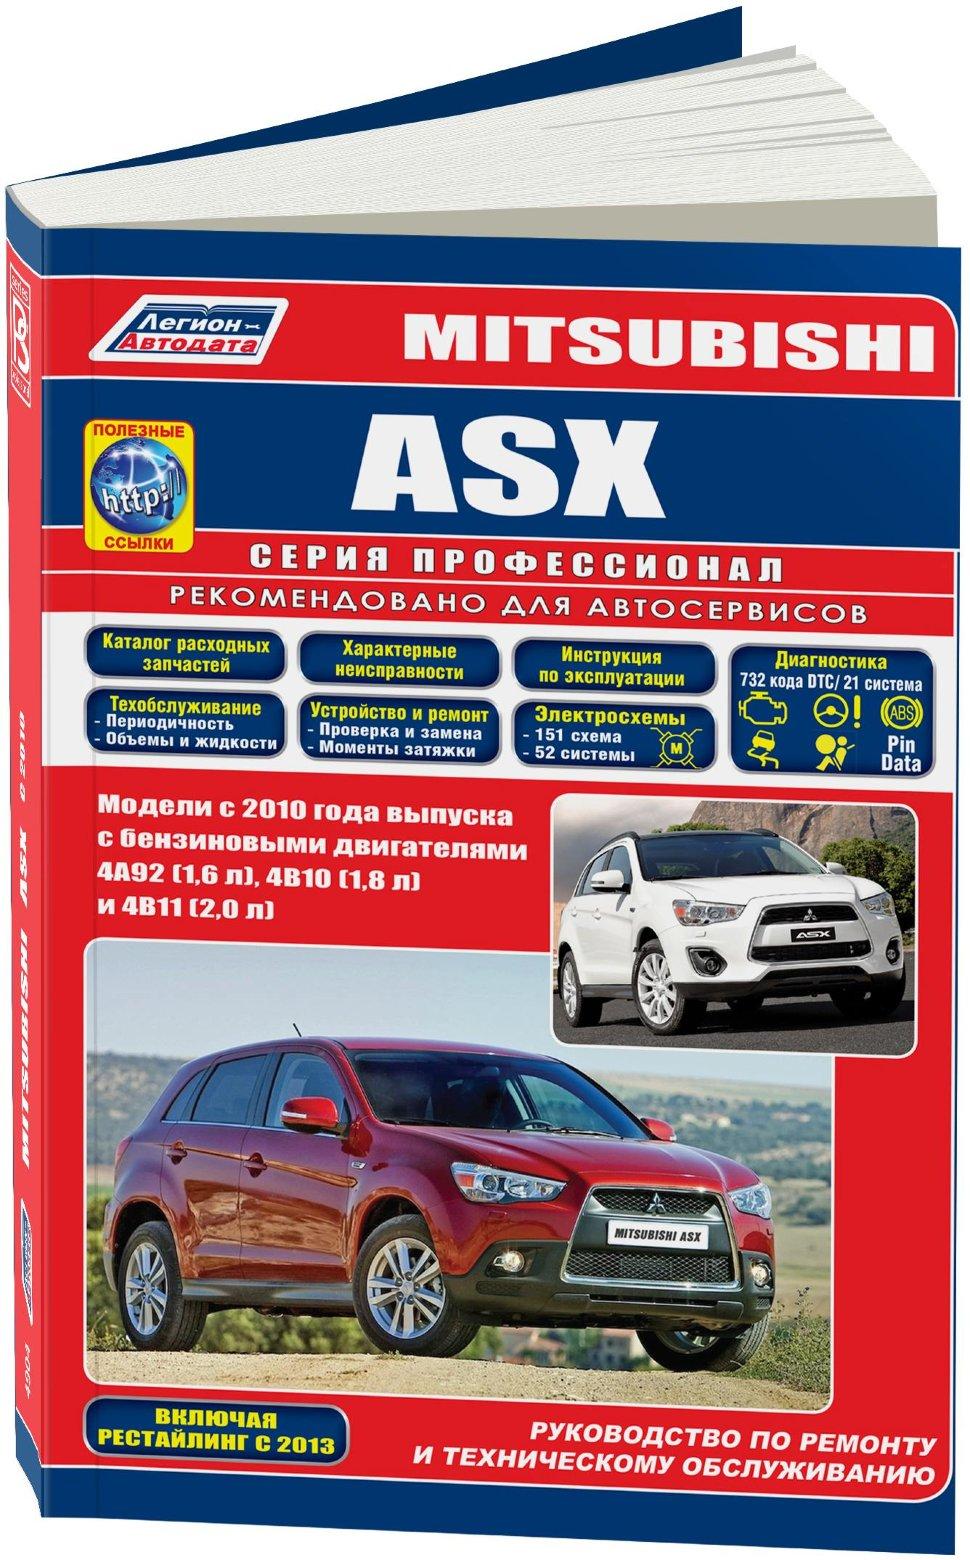 Mitsubishi asx ремонт своими руками